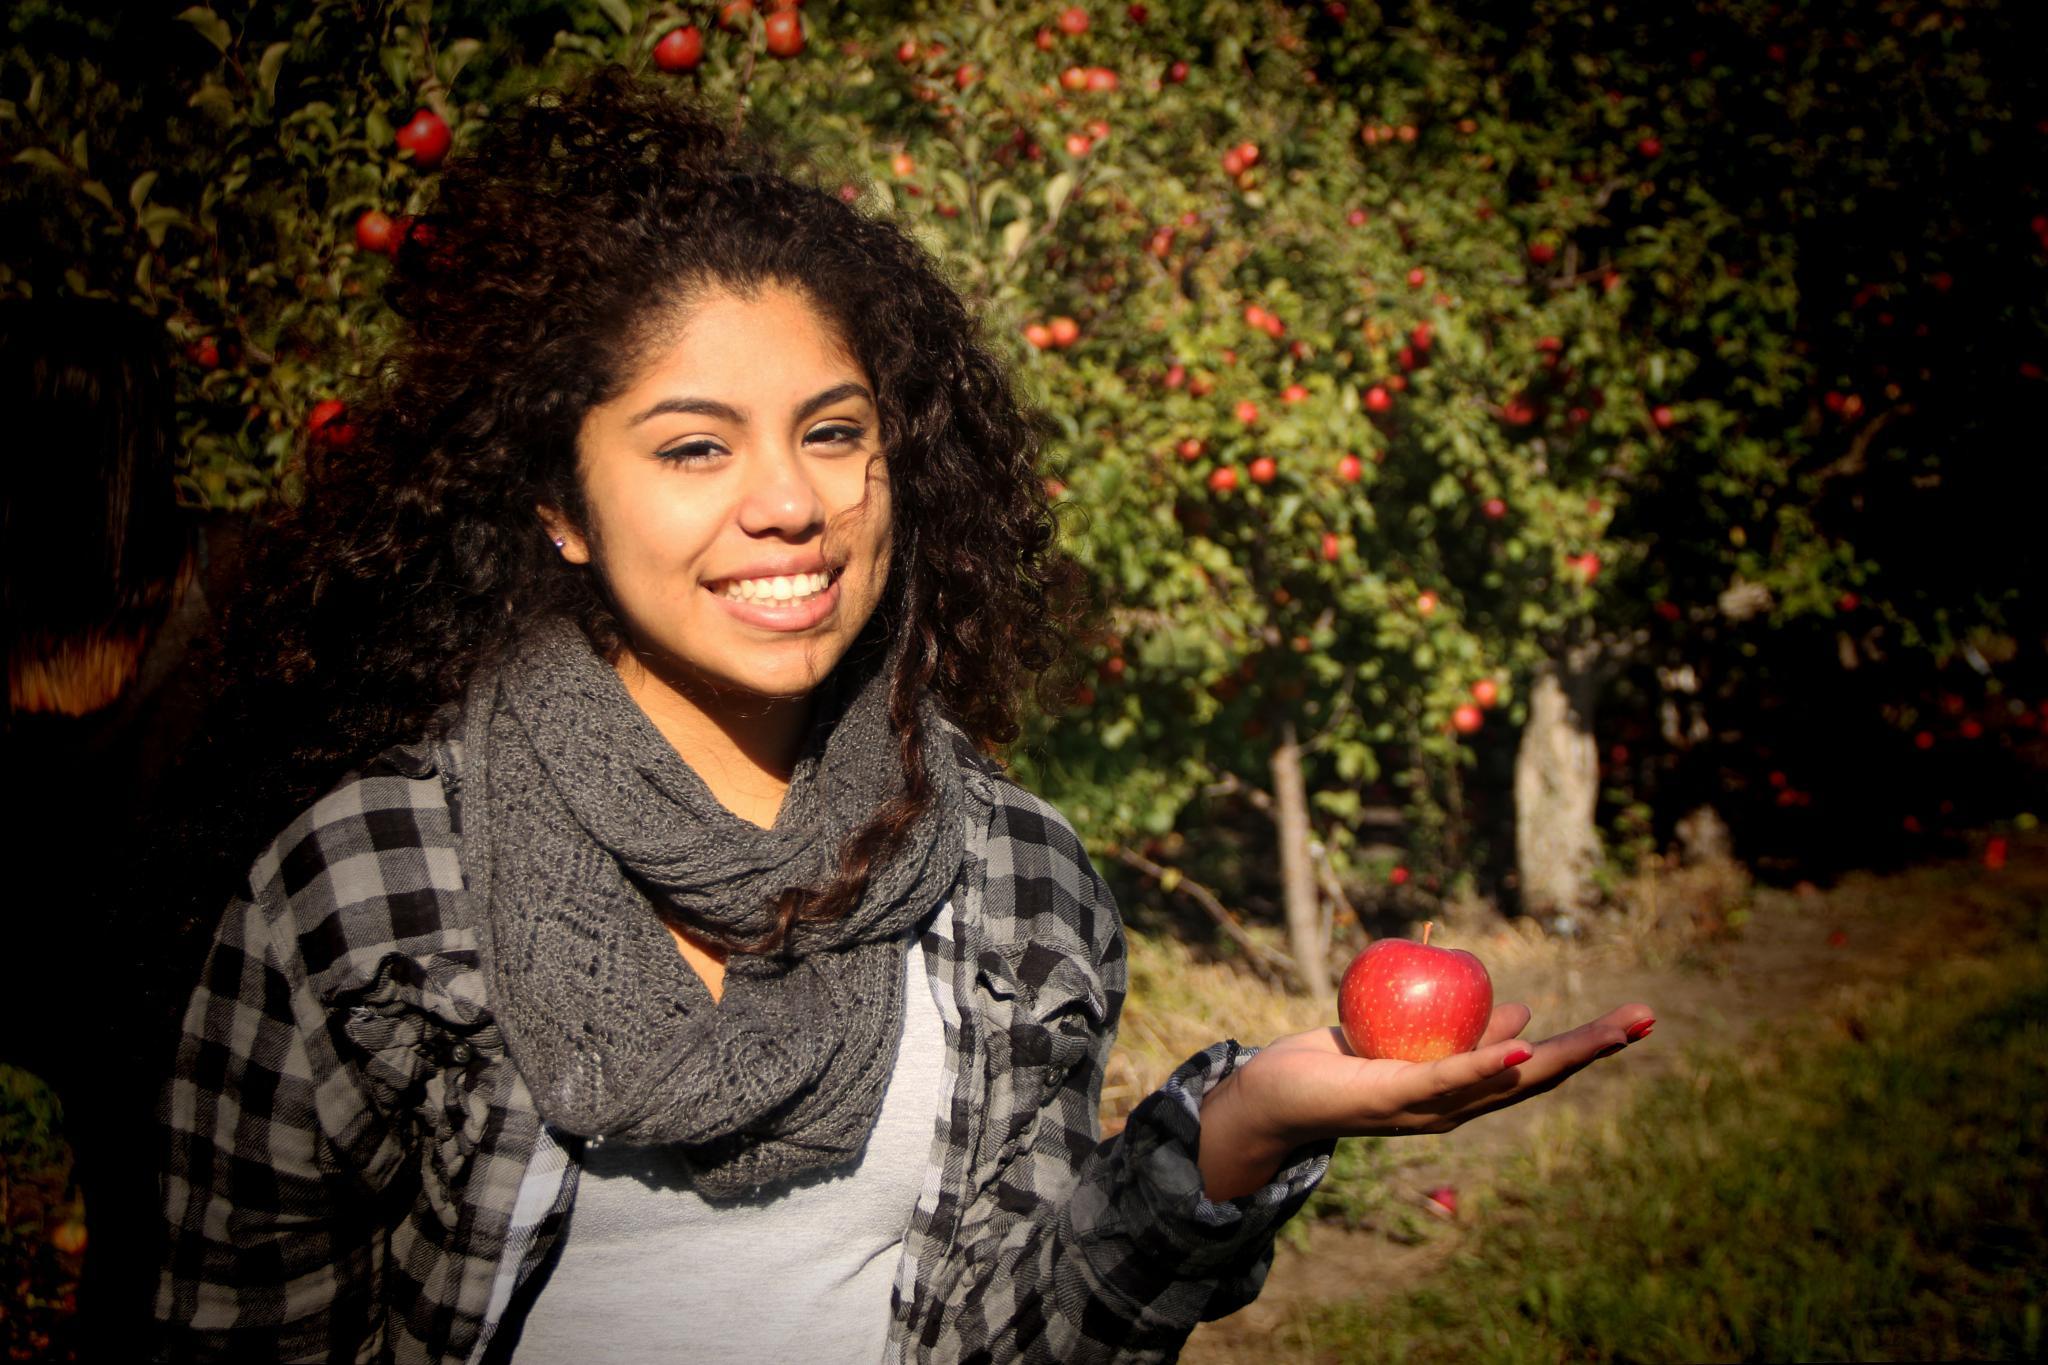 Apple Girl by Pintor72